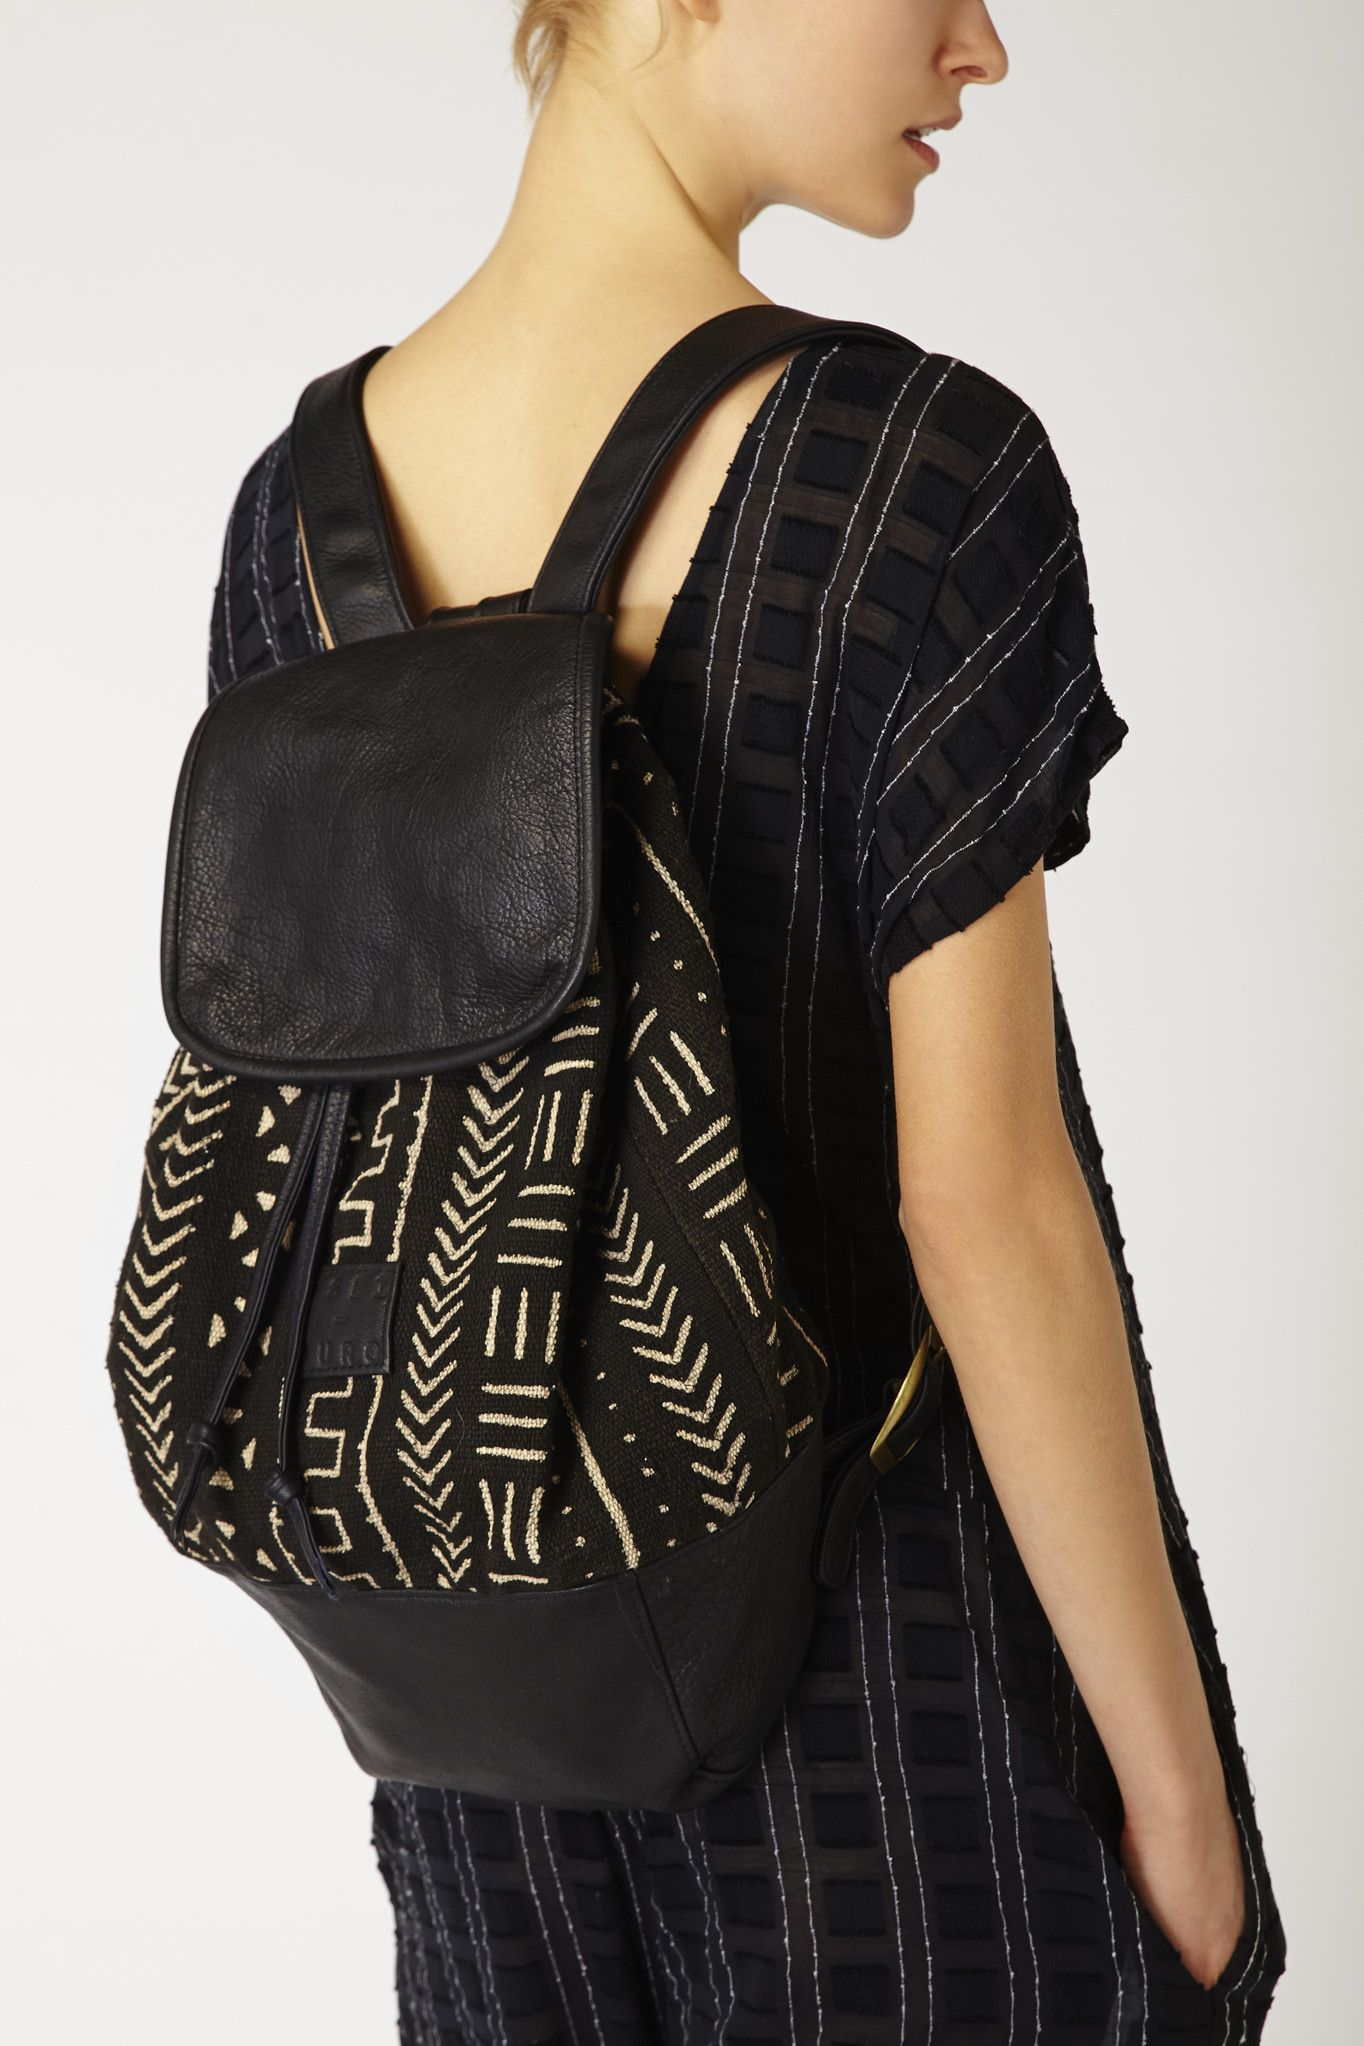 Mantika Backpack by Osei-Duro